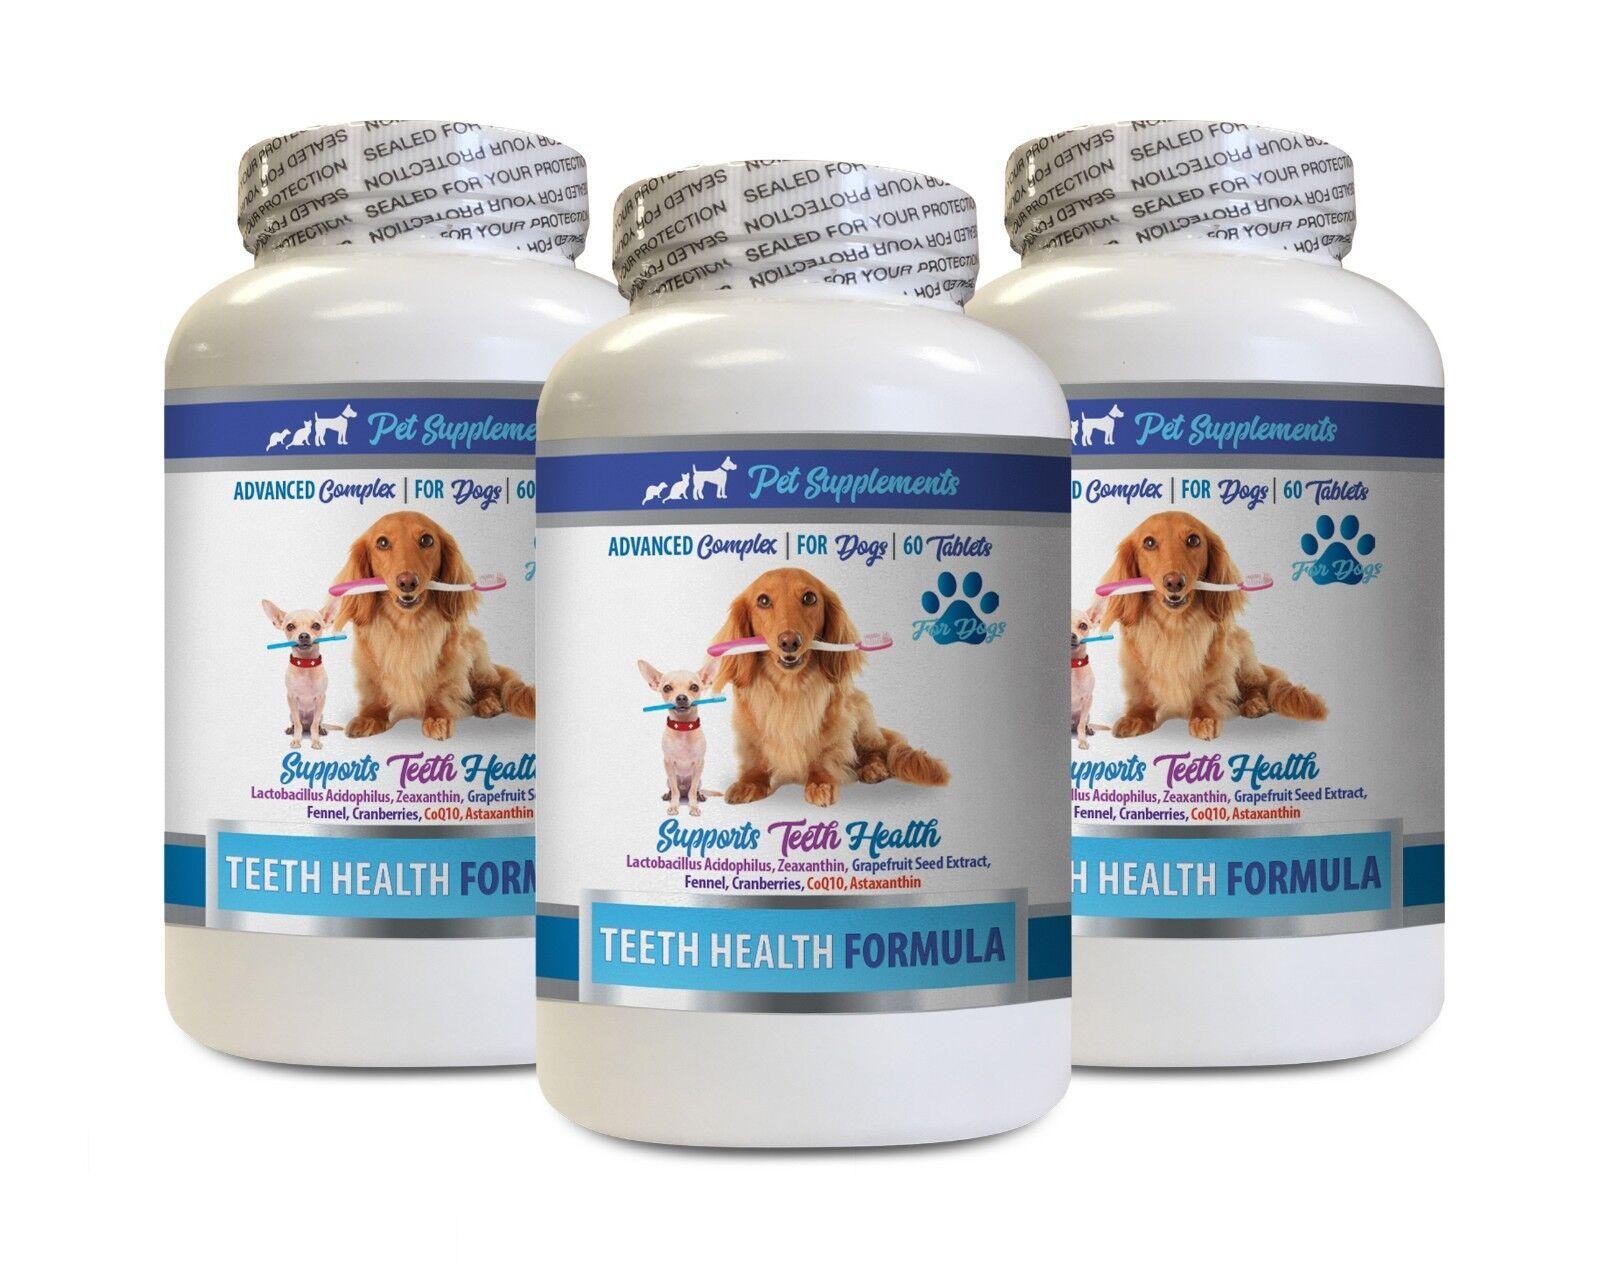 outlet online Oral care for dogs - DOG TEETH TEETH TEETH HEALTH FORMULA 3B - dog vitamin c  contatore genuino